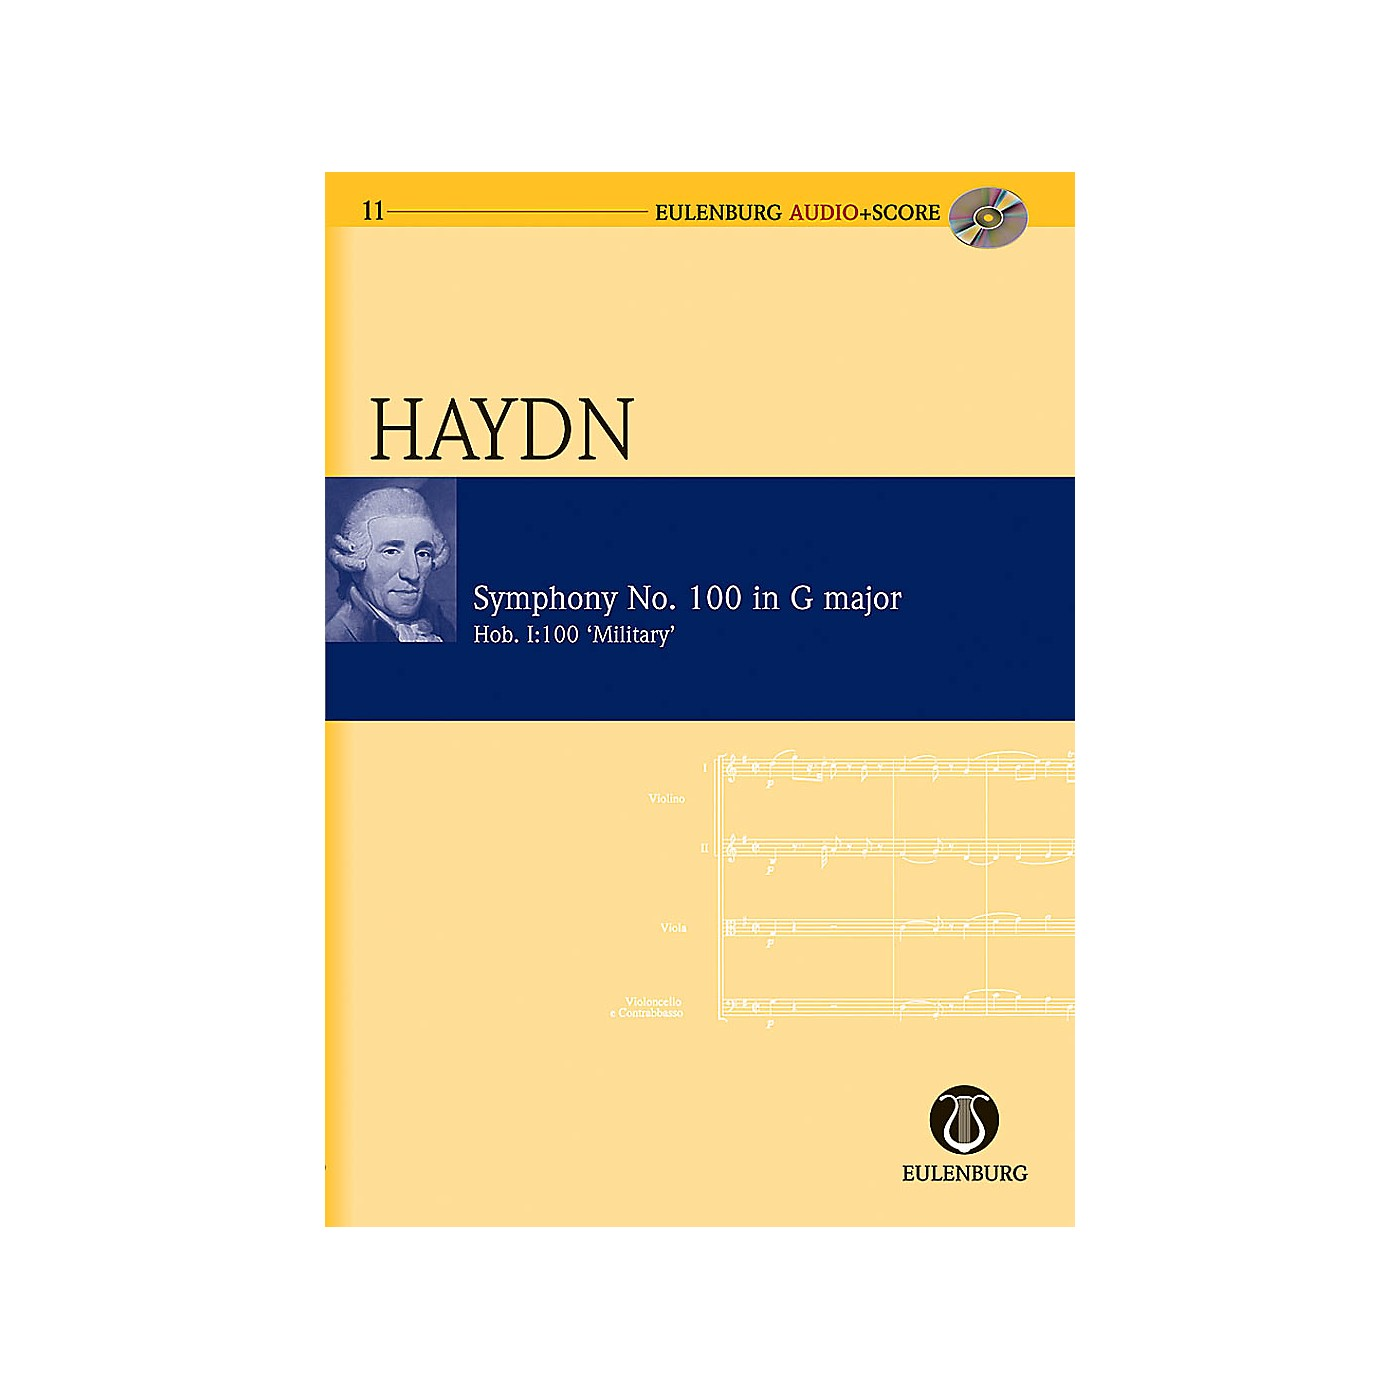 Eulenburg Symphony No. 100 in G Major (Military) Hob. I:100 London No. 12 Eulenberg Audio plus Score by Haydn thumbnail